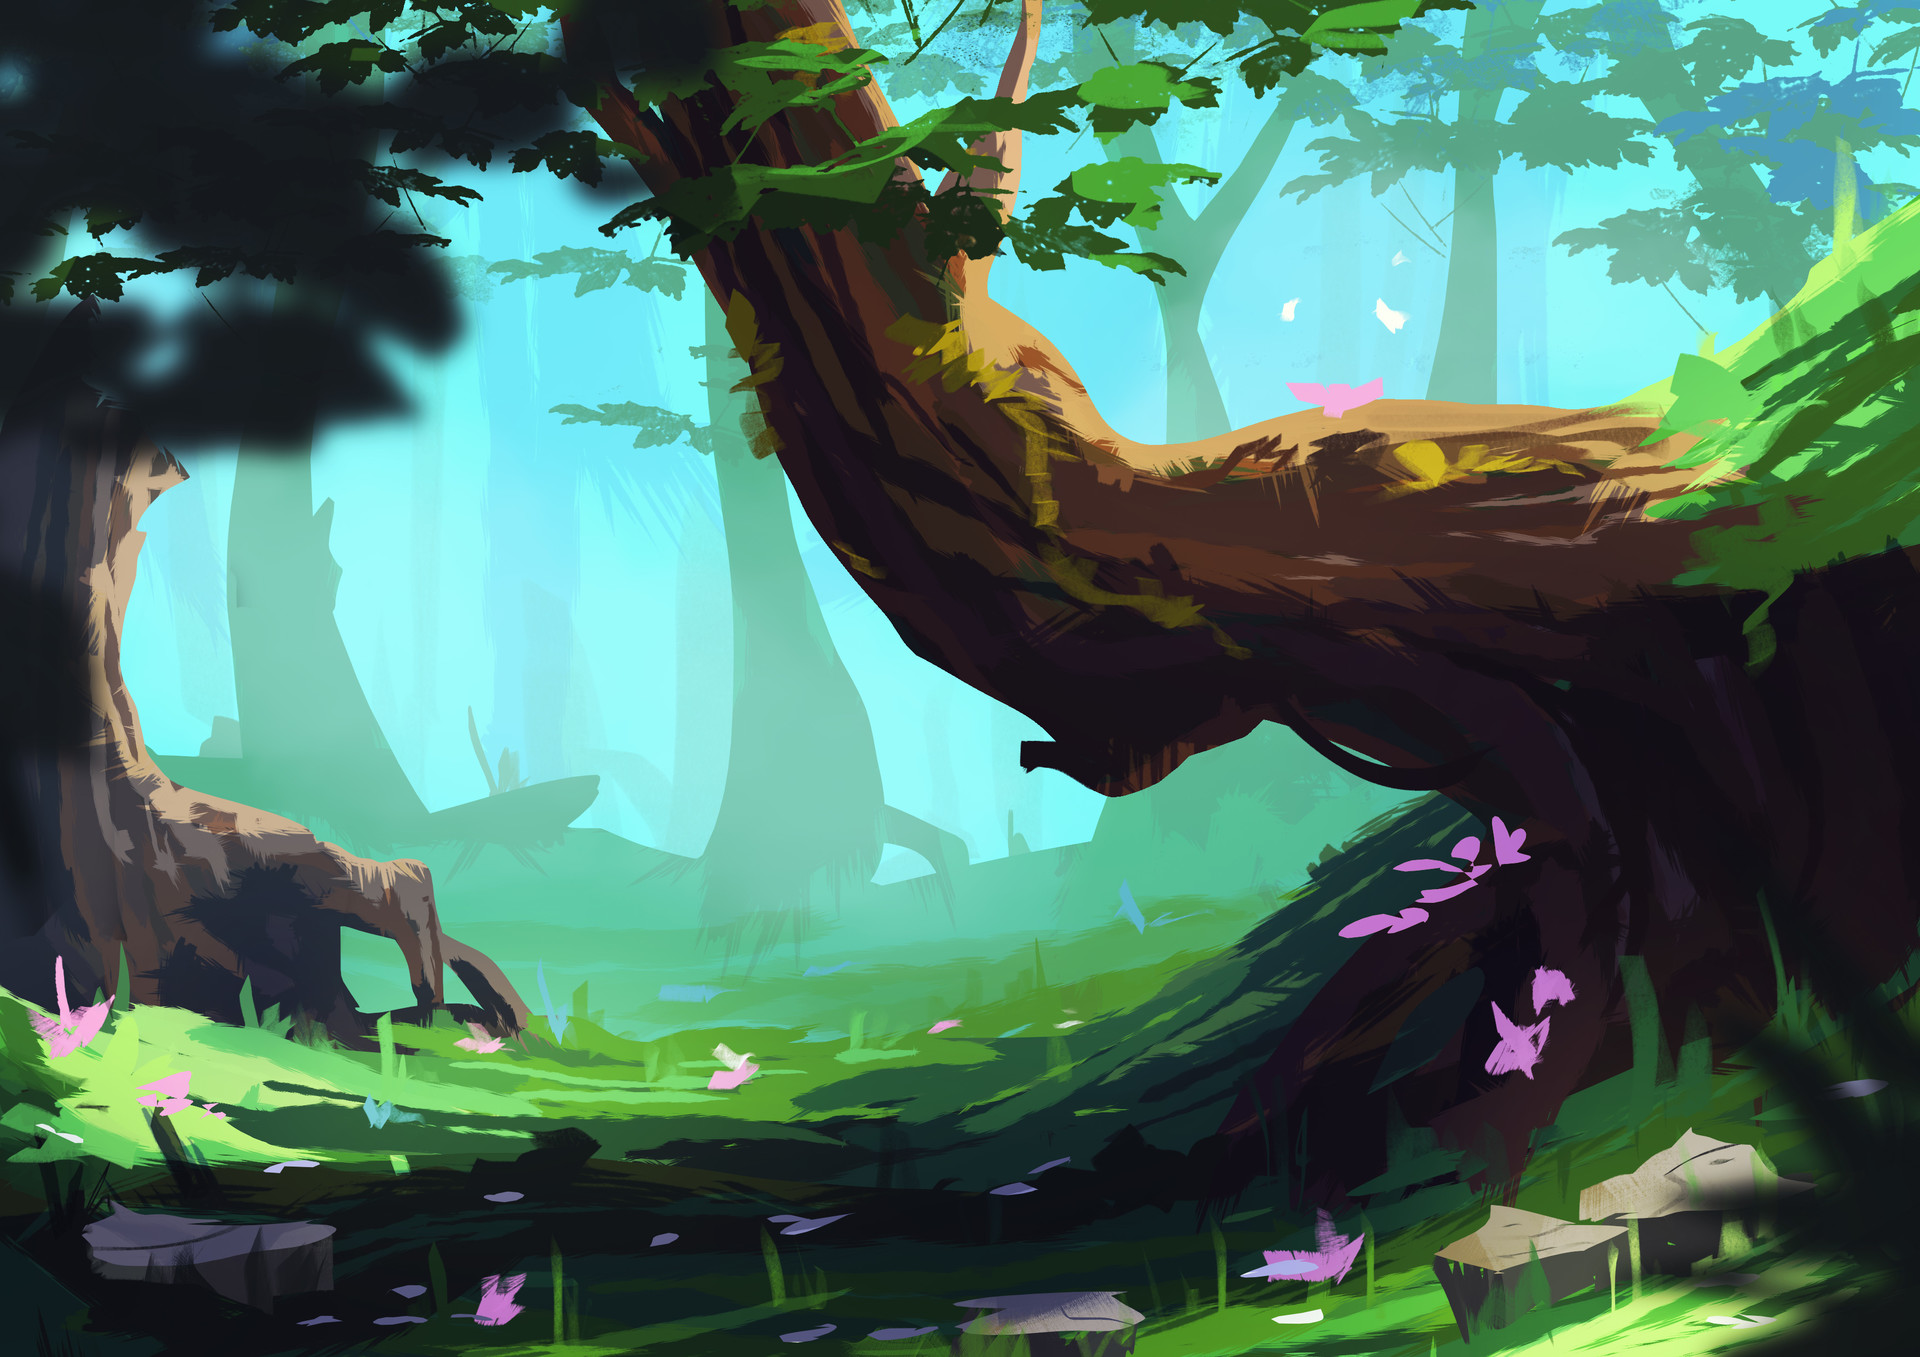 ArtStation - Forest Concept Art, Elise Mathez